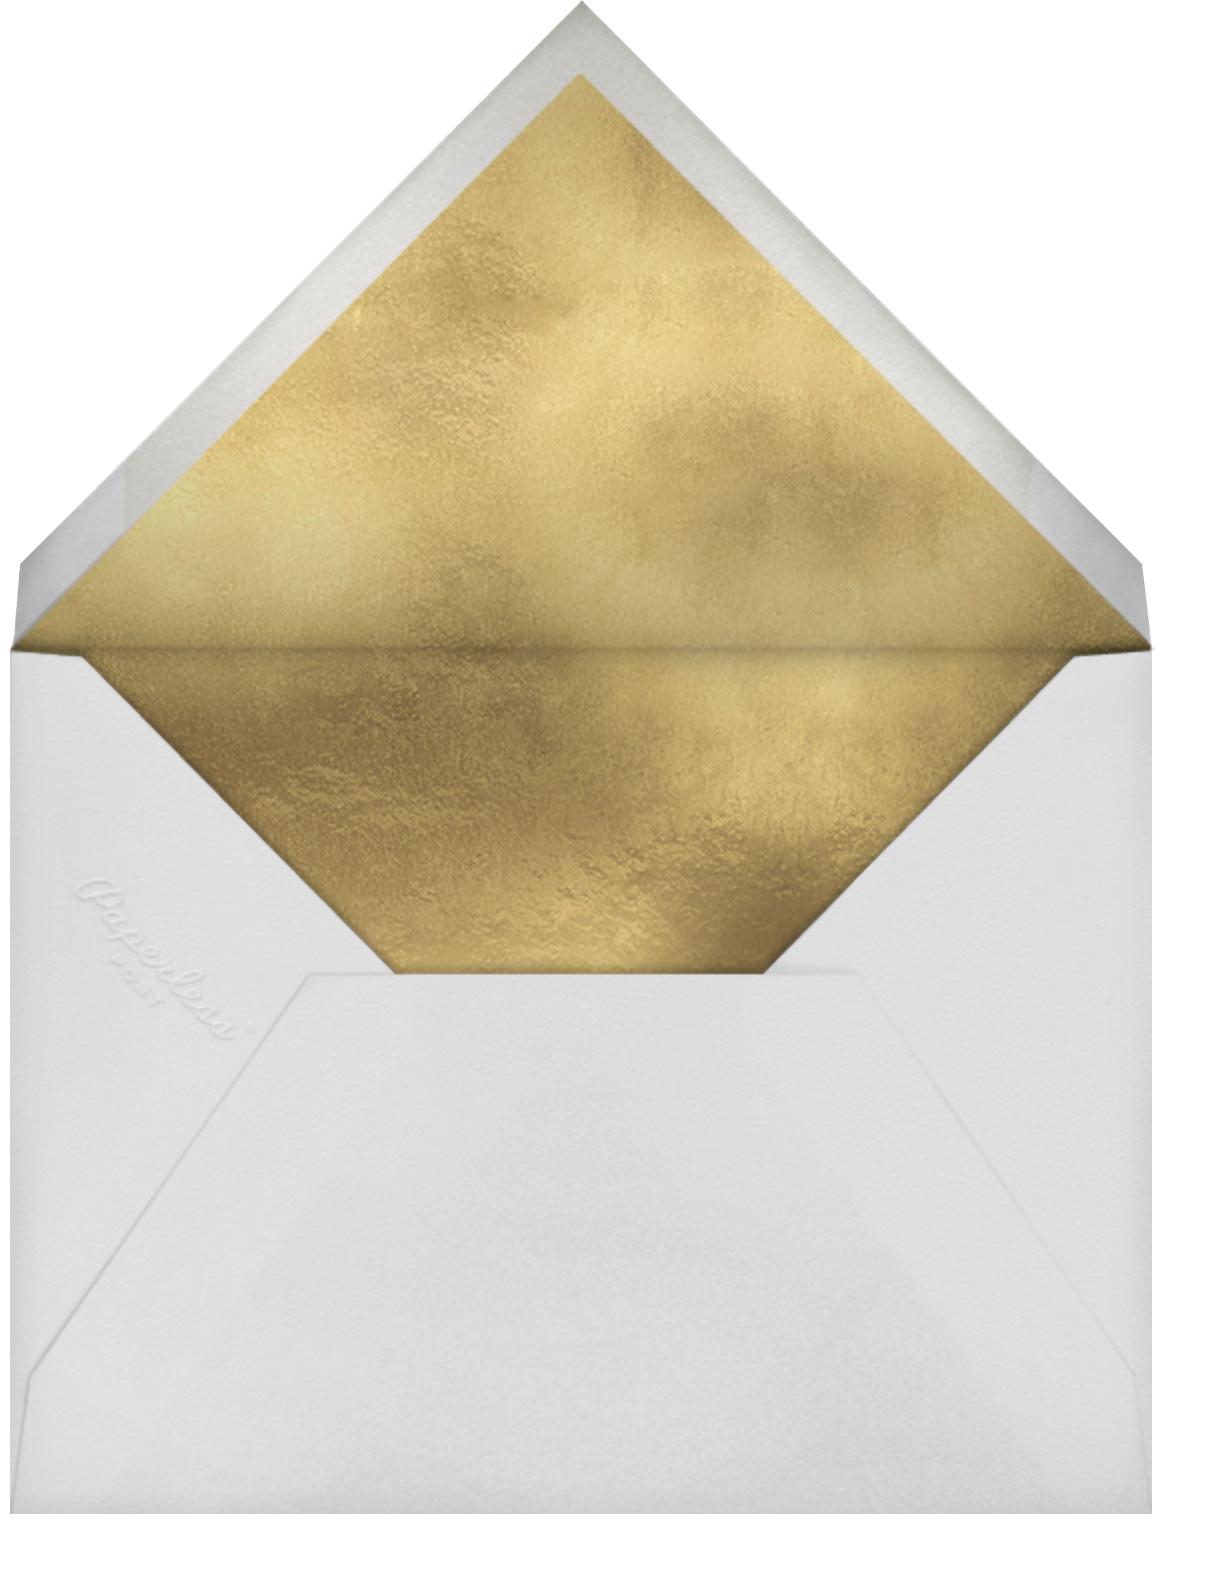 Budding Vine - Gold - Rifle Paper Co. - Photo  - envelope back